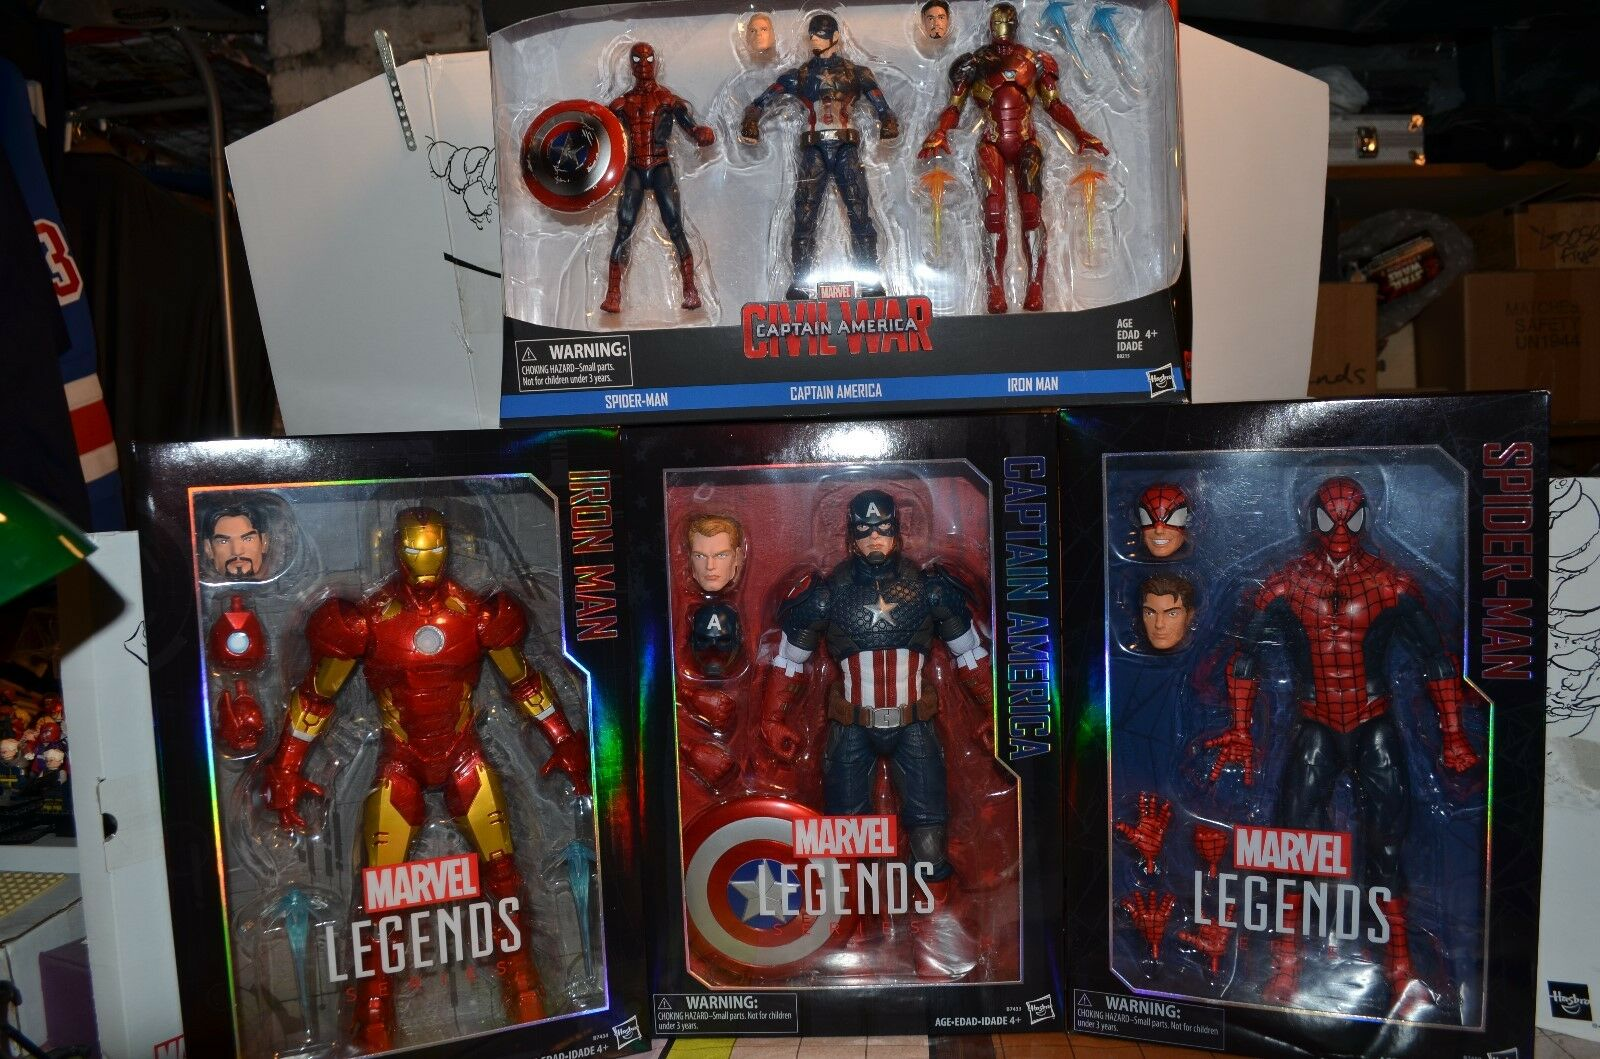 Marvel - legenden brgerkrieg menge symbole.